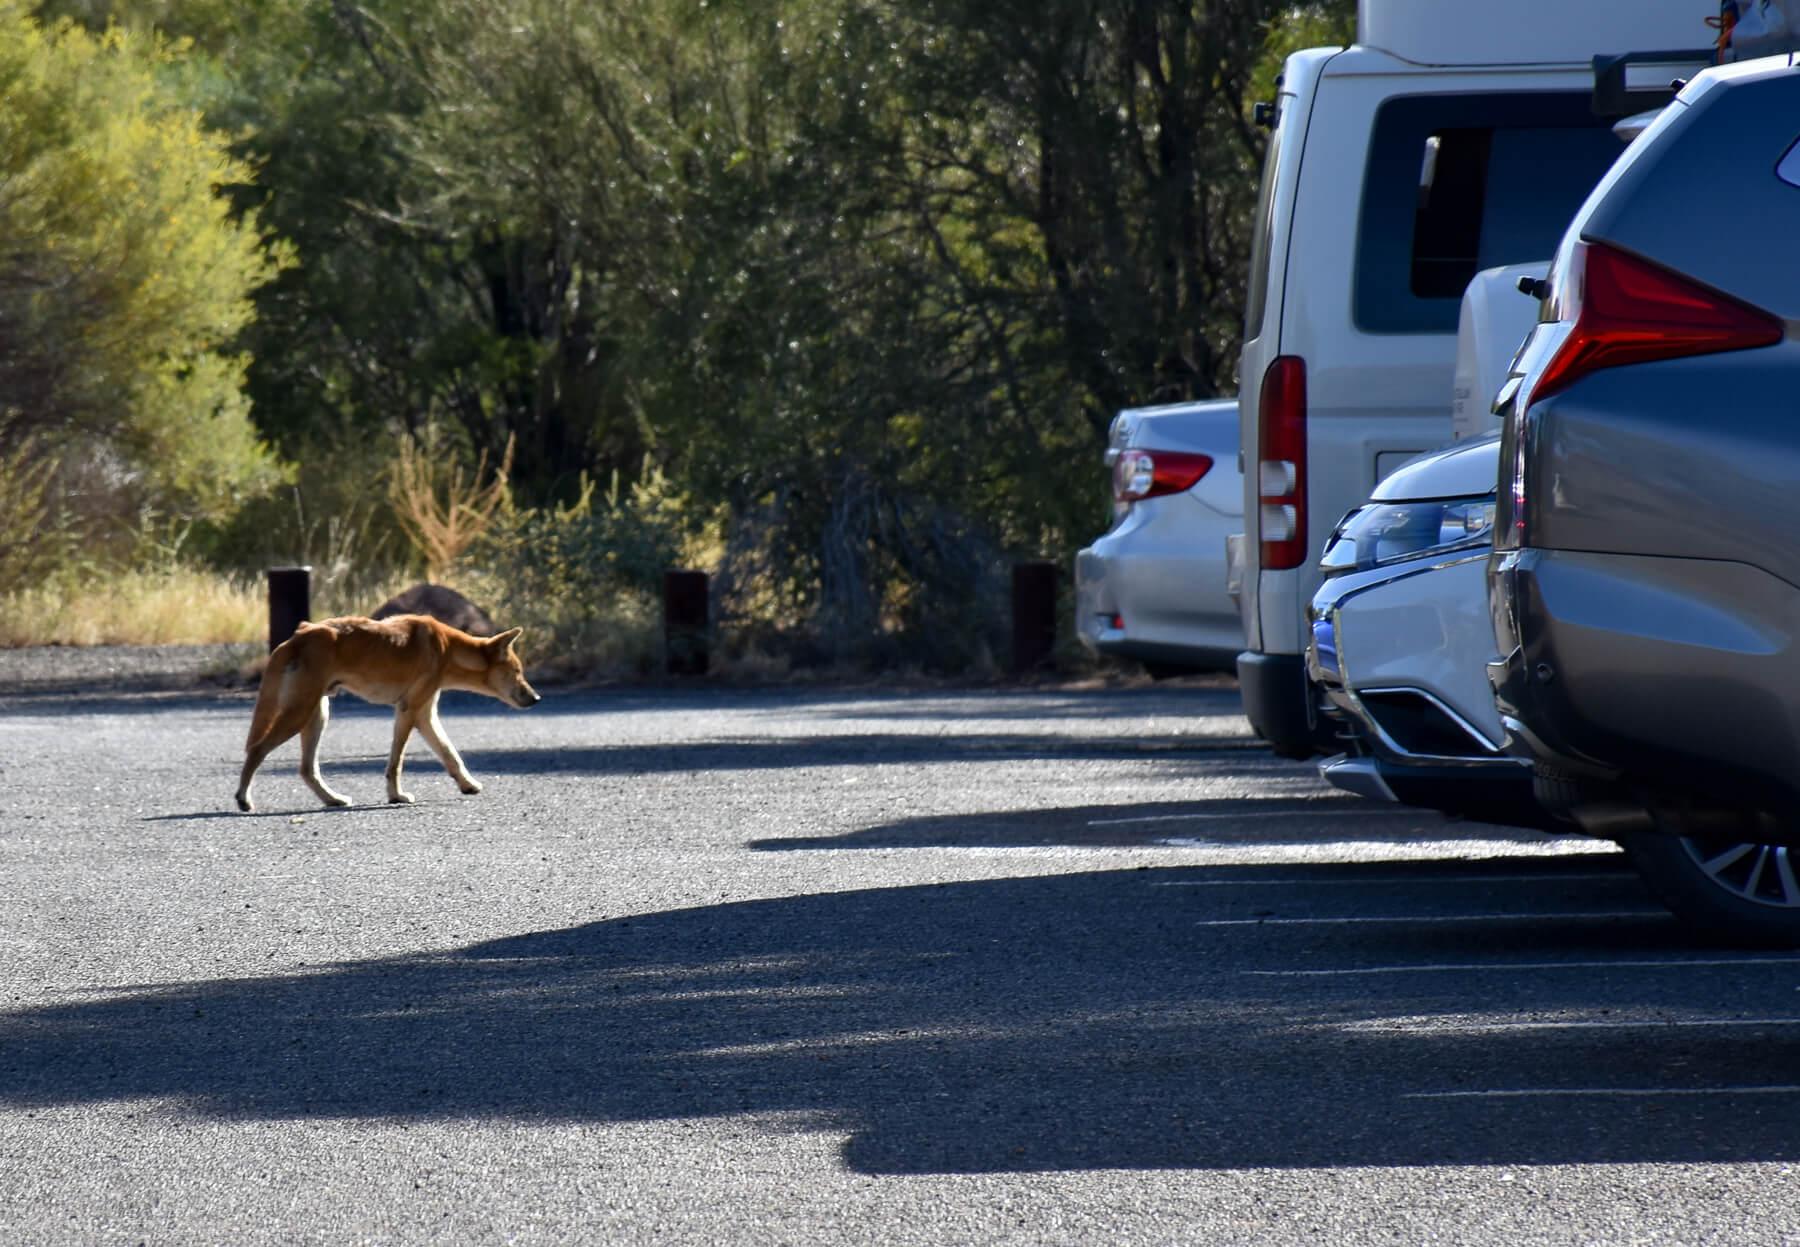 Very thin Dingo walking through the carpark